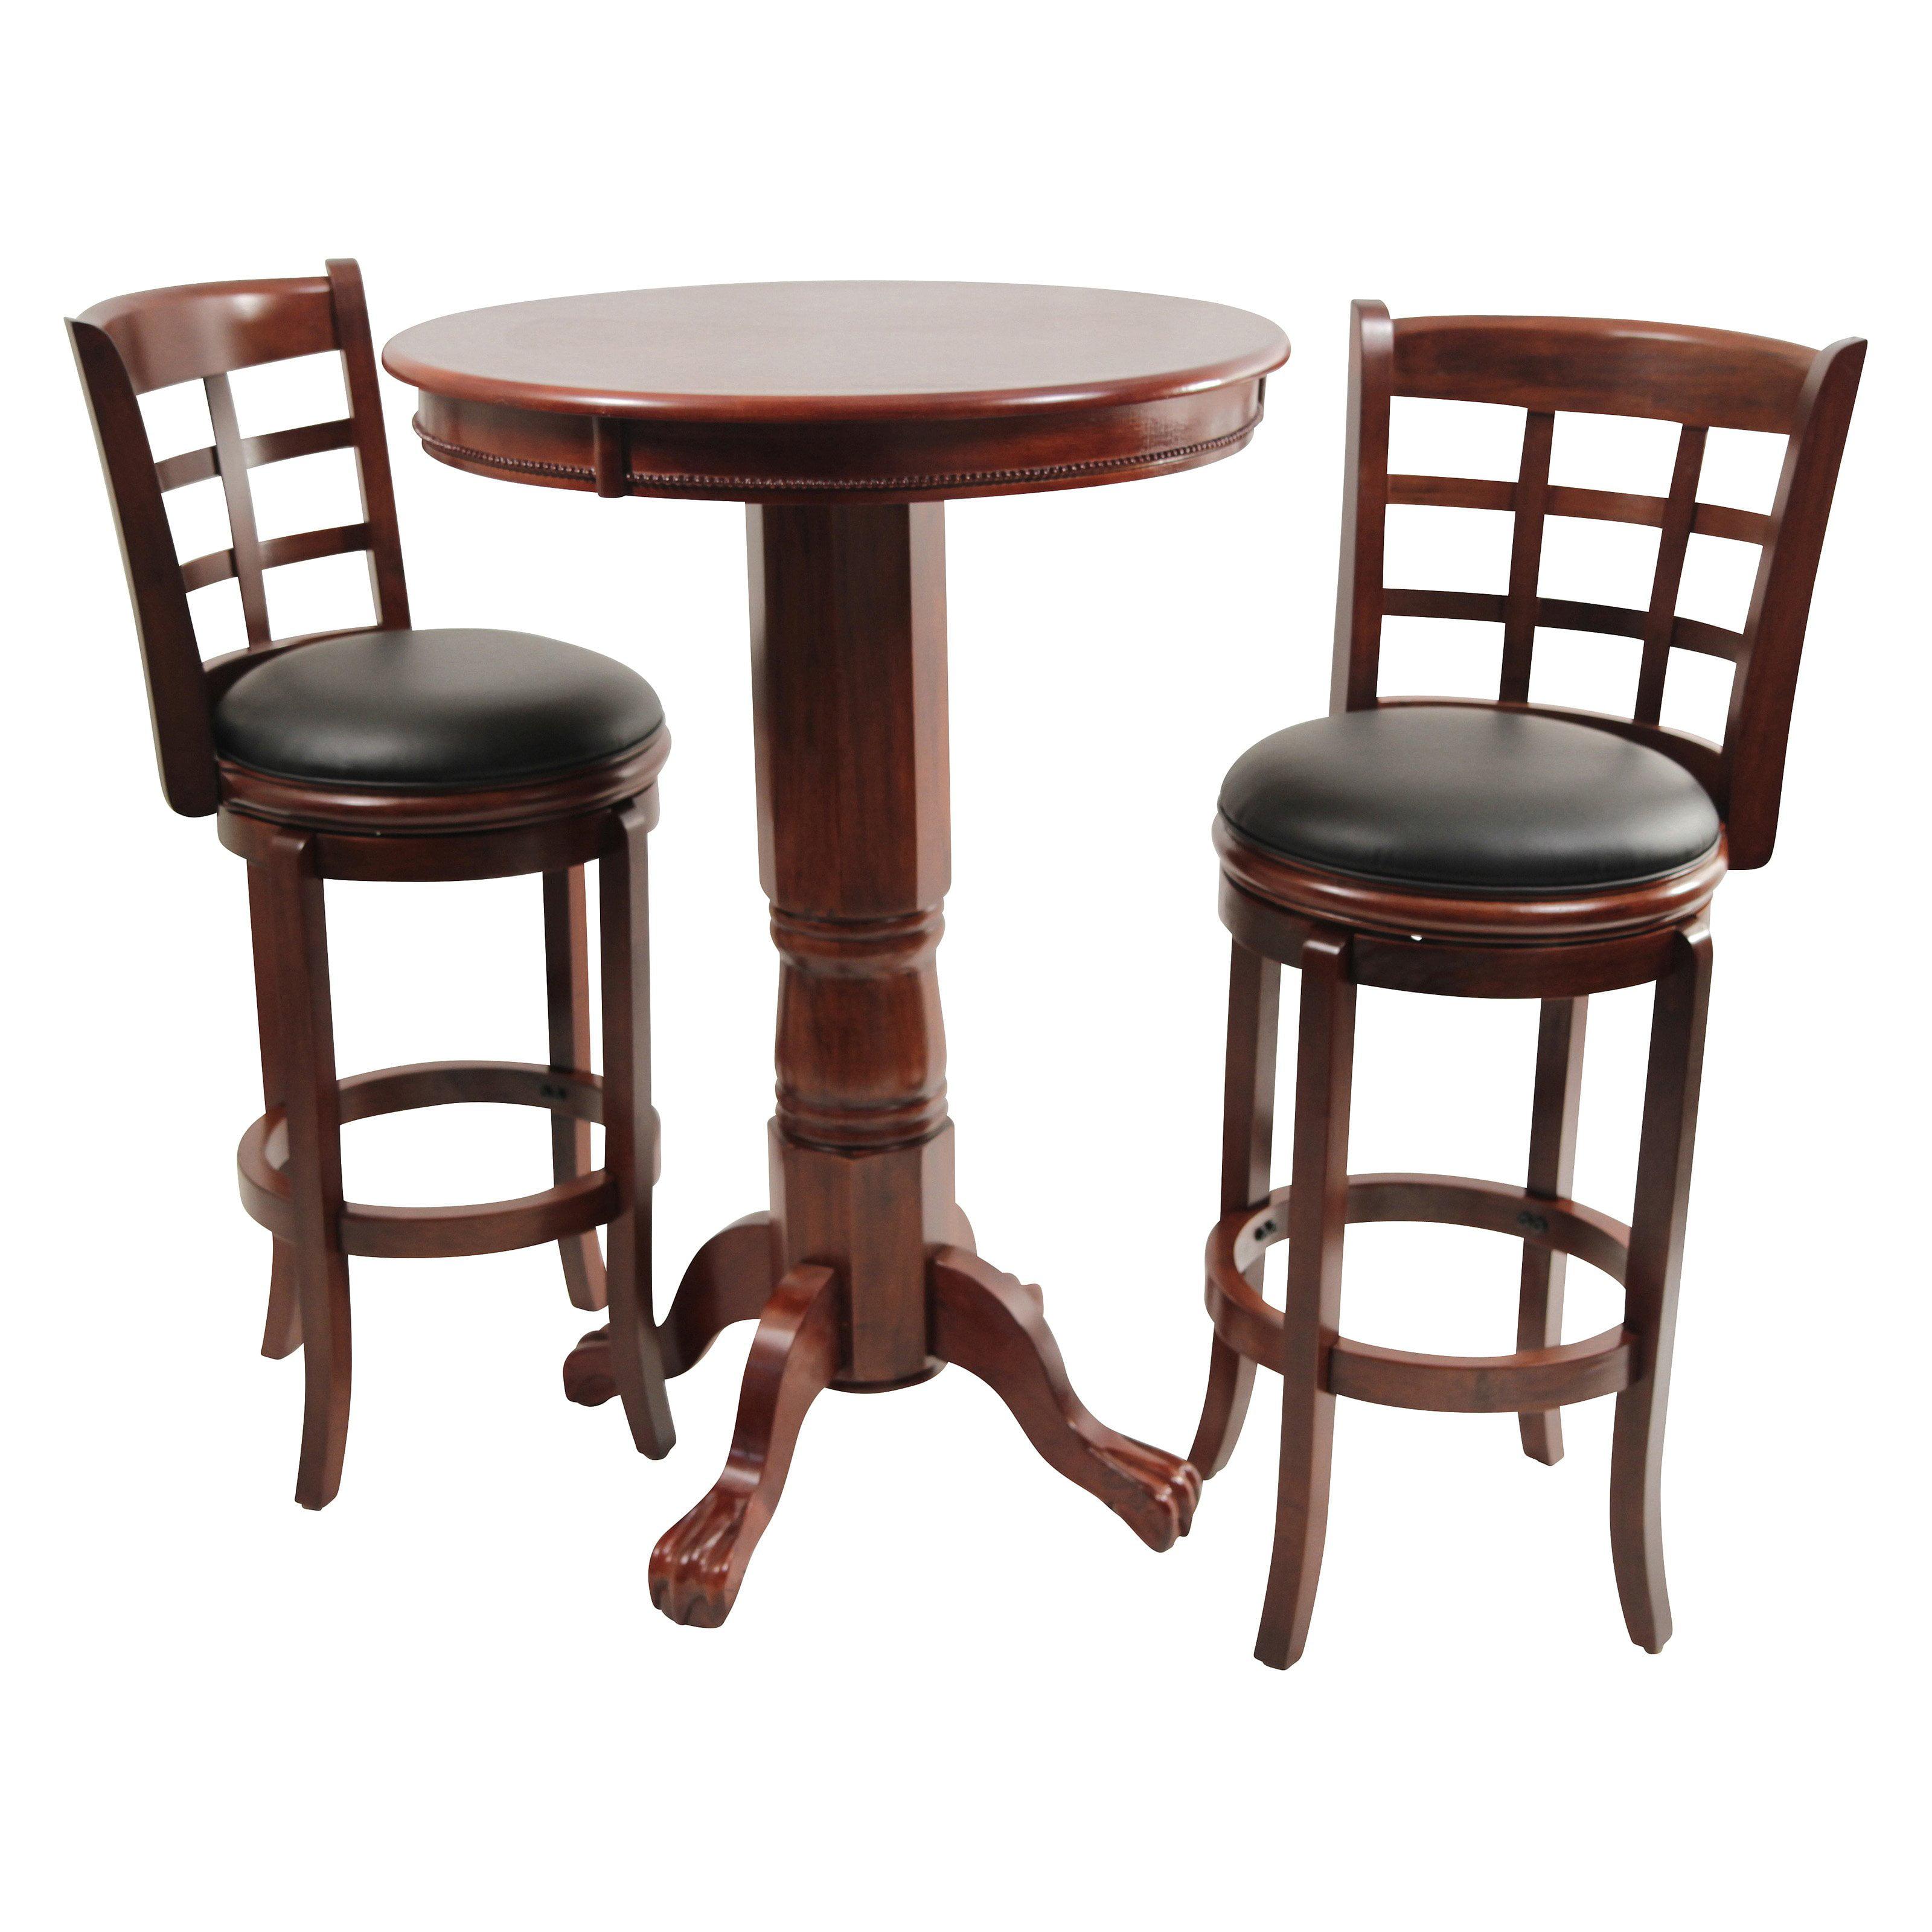 Boraam Kyoto 3 Piece Pub Table Set Dark Cherry by Boraam Industries LLC